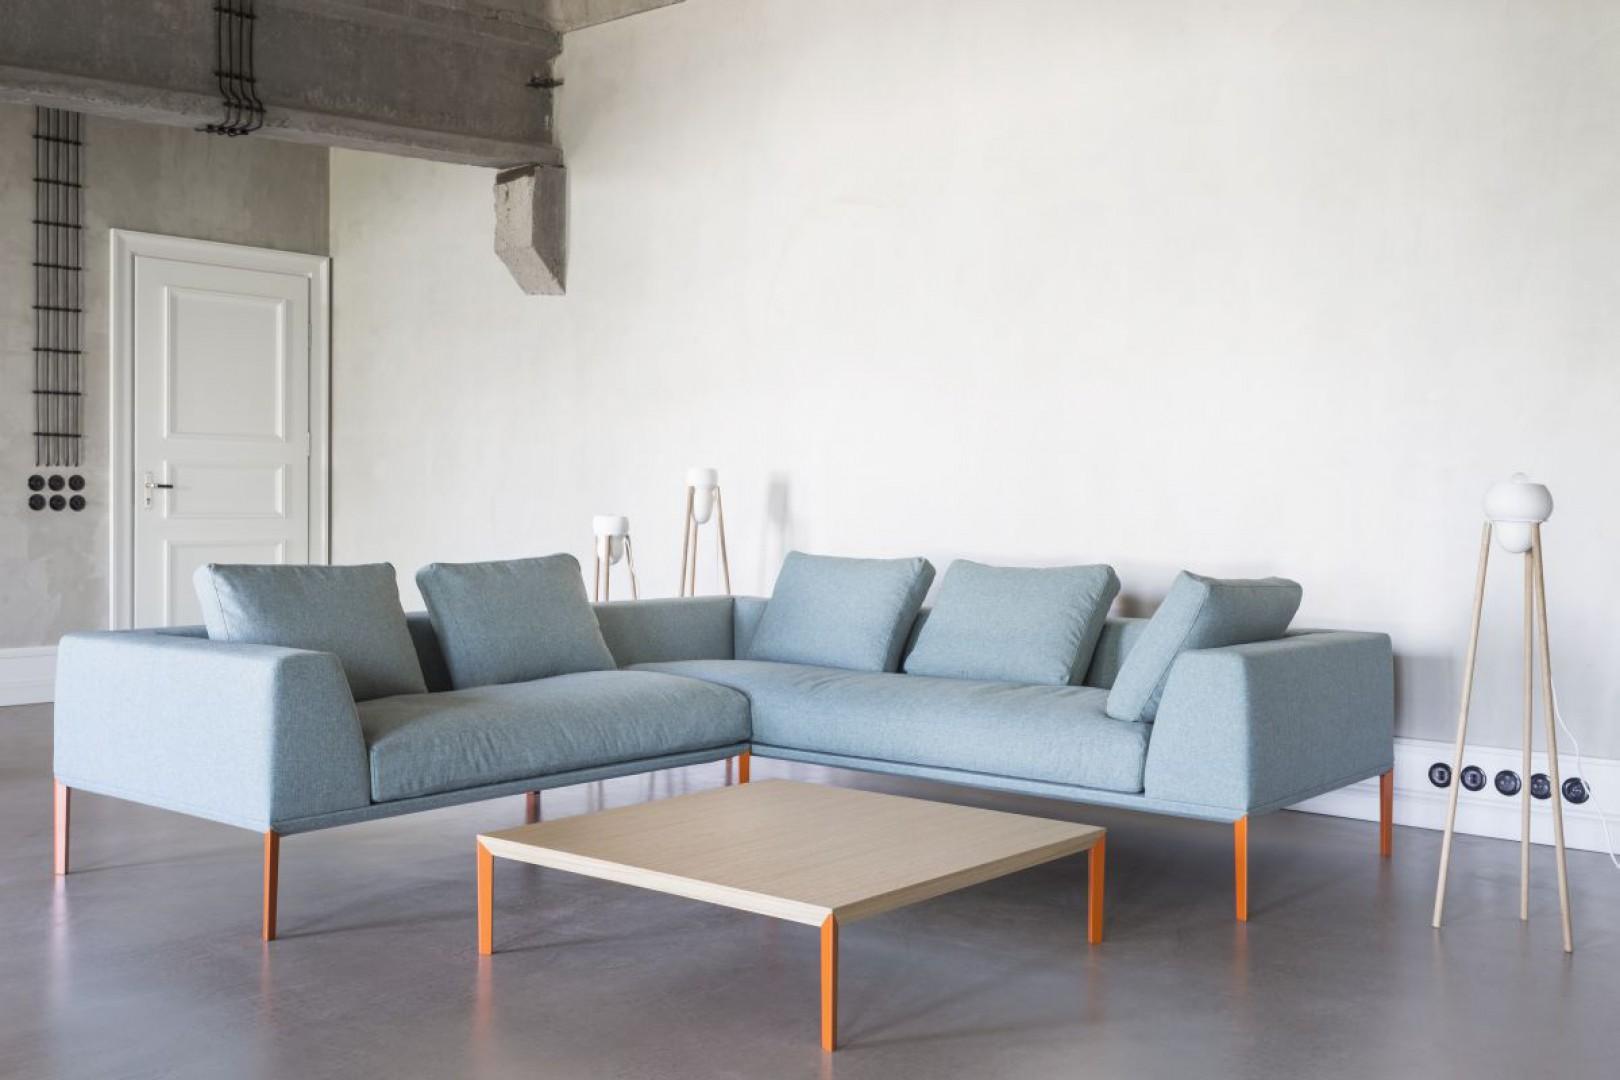 Sofa Sosa z oferty firmy Noti. Fot. Noti